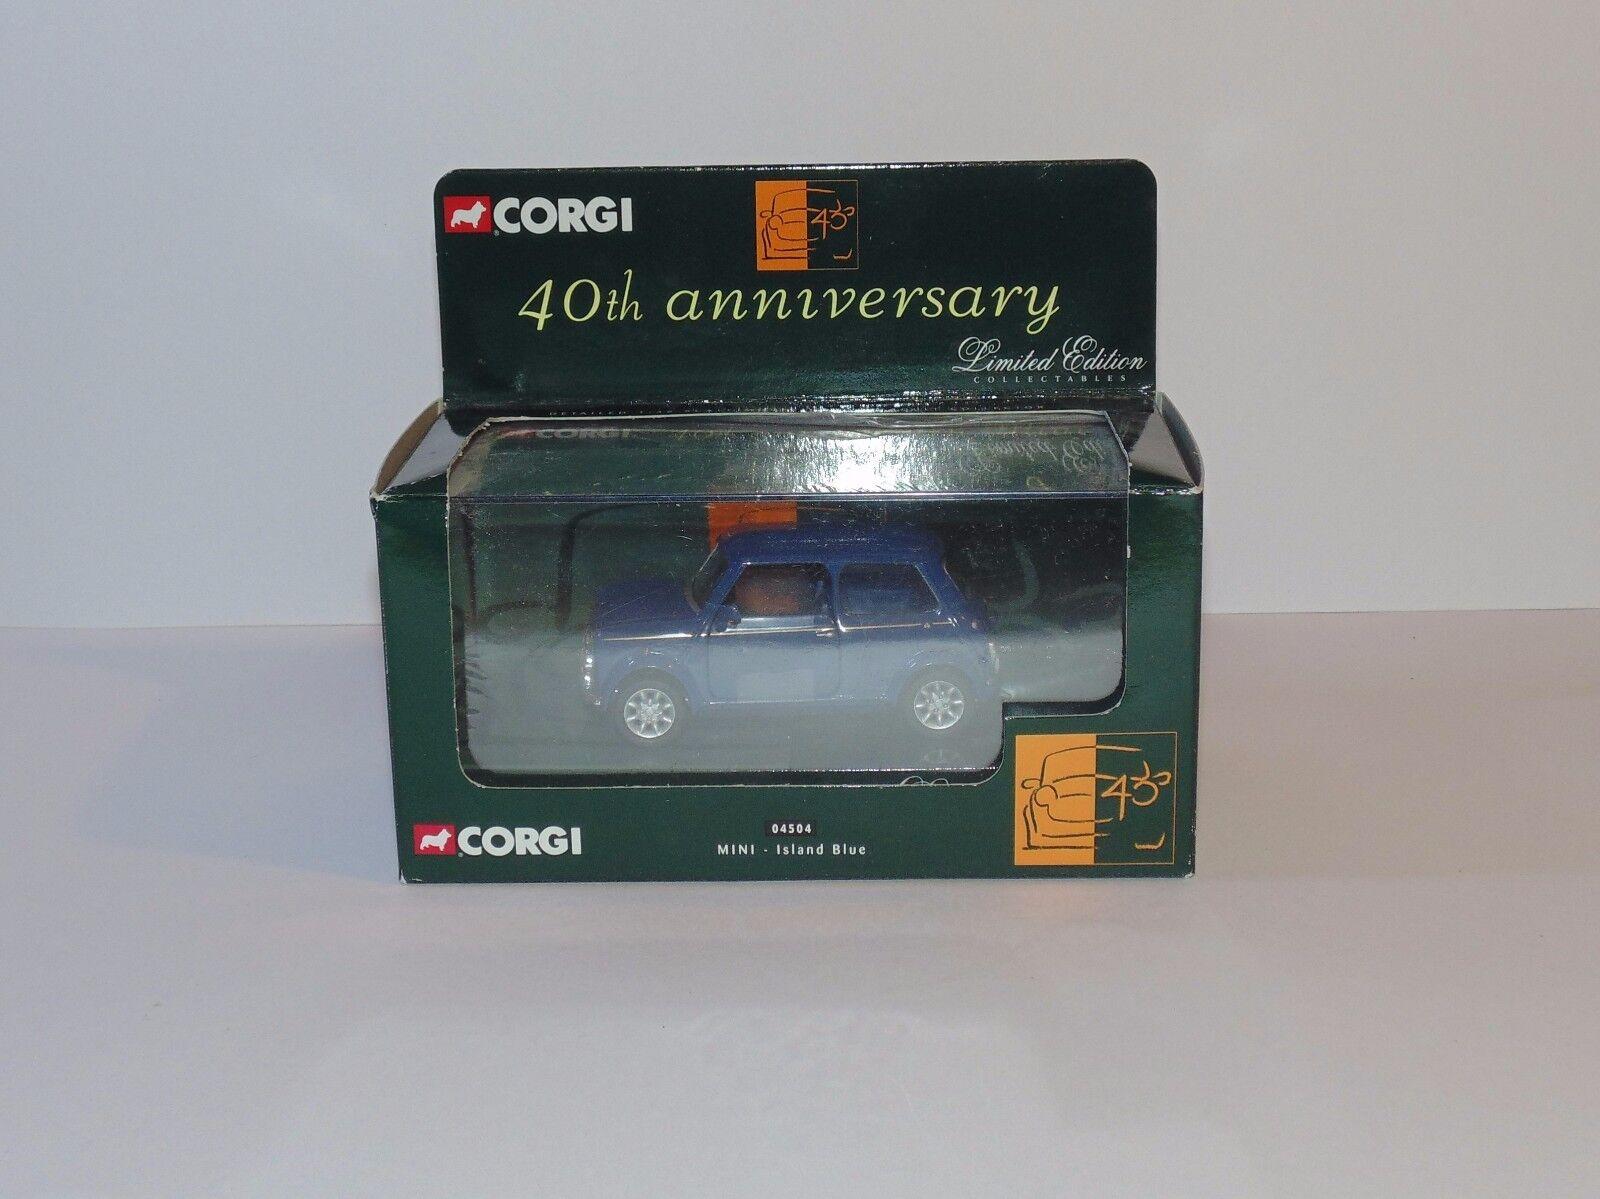 Diecast Corgi Classic Limited Edition Mini-Island bleu 40th Anniversaire